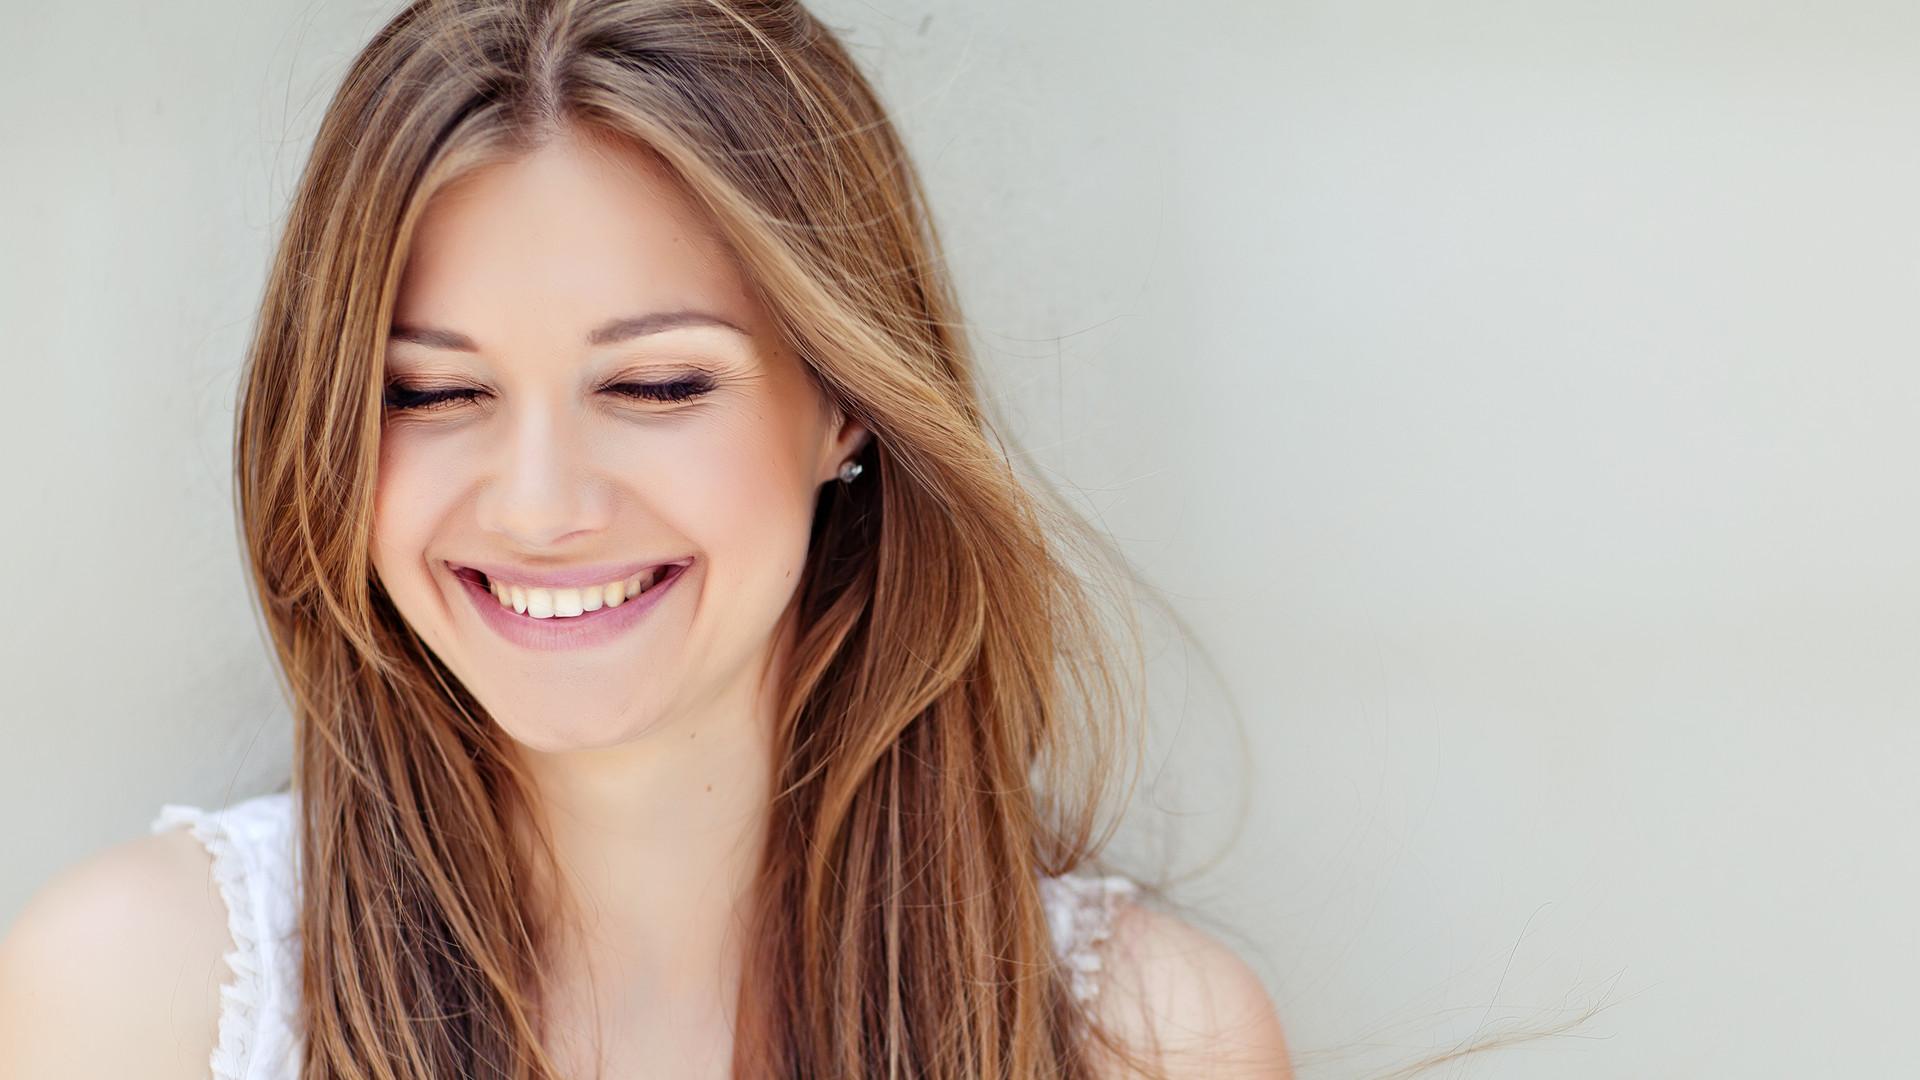 Beautiful woman smiling.jpg